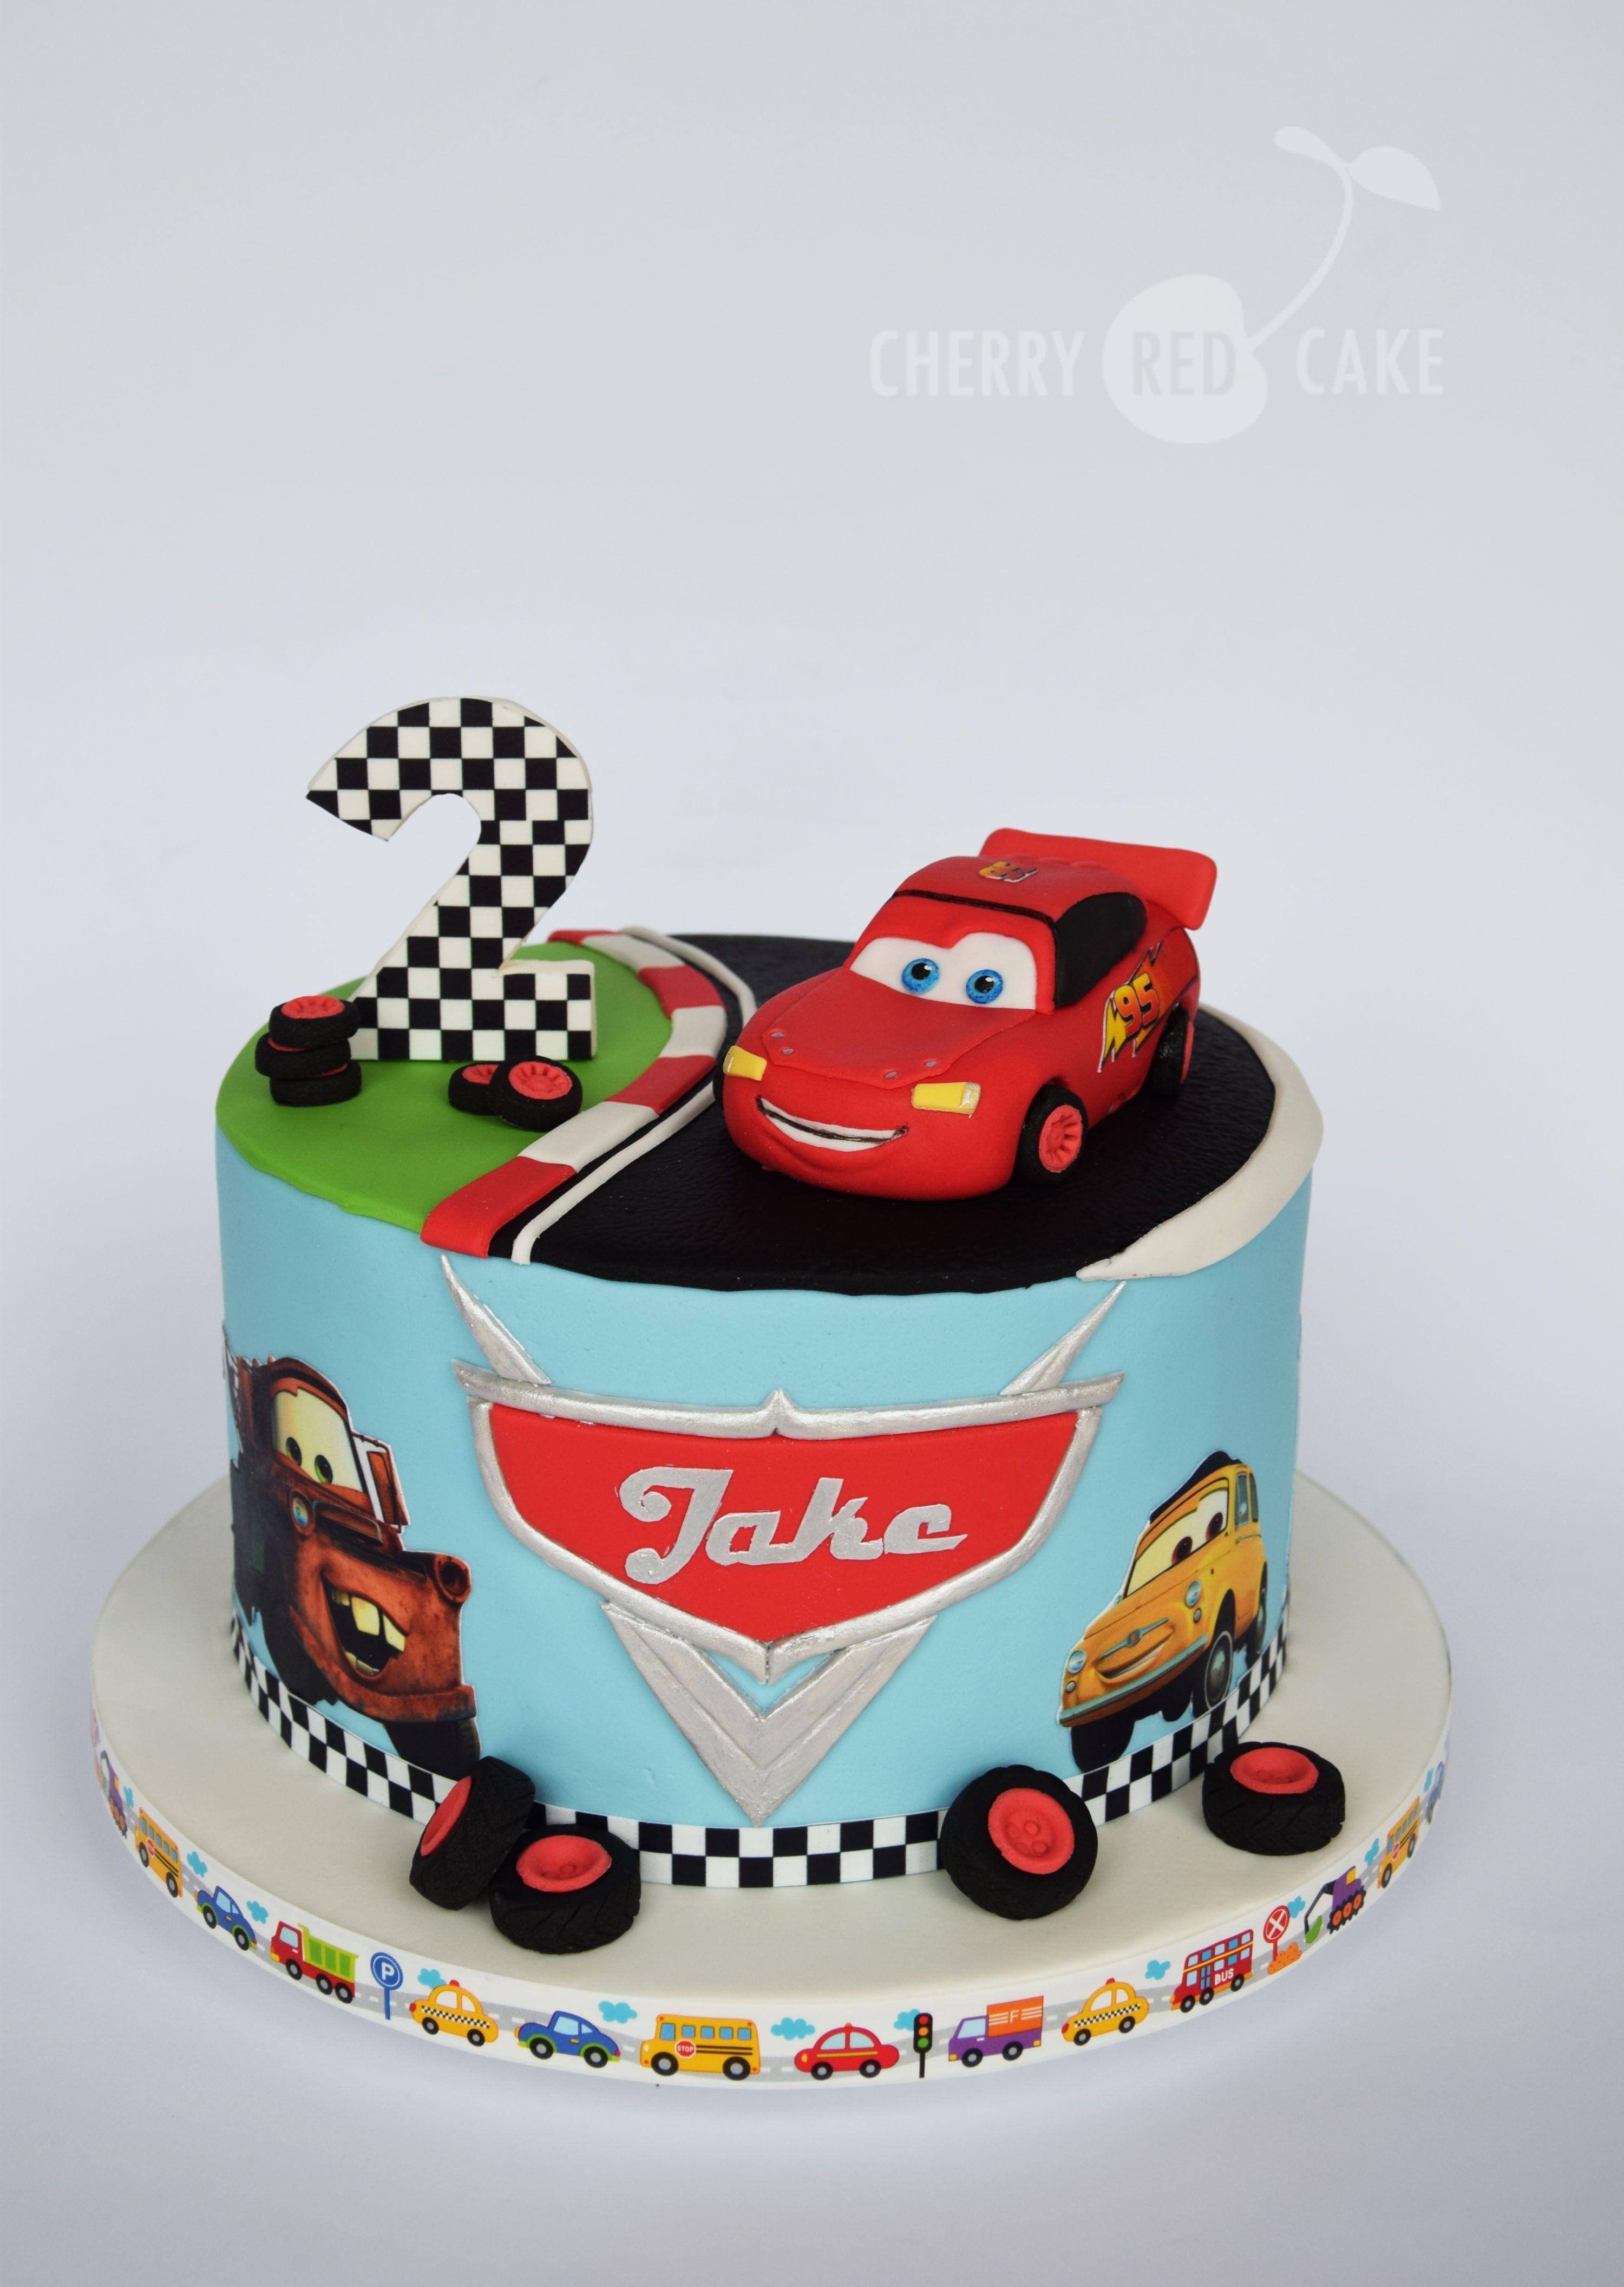 Outstanding Lightning Mcqueen Cake Design The Cake Boutique Funny Birthday Cards Online Ioscodamsfinfo